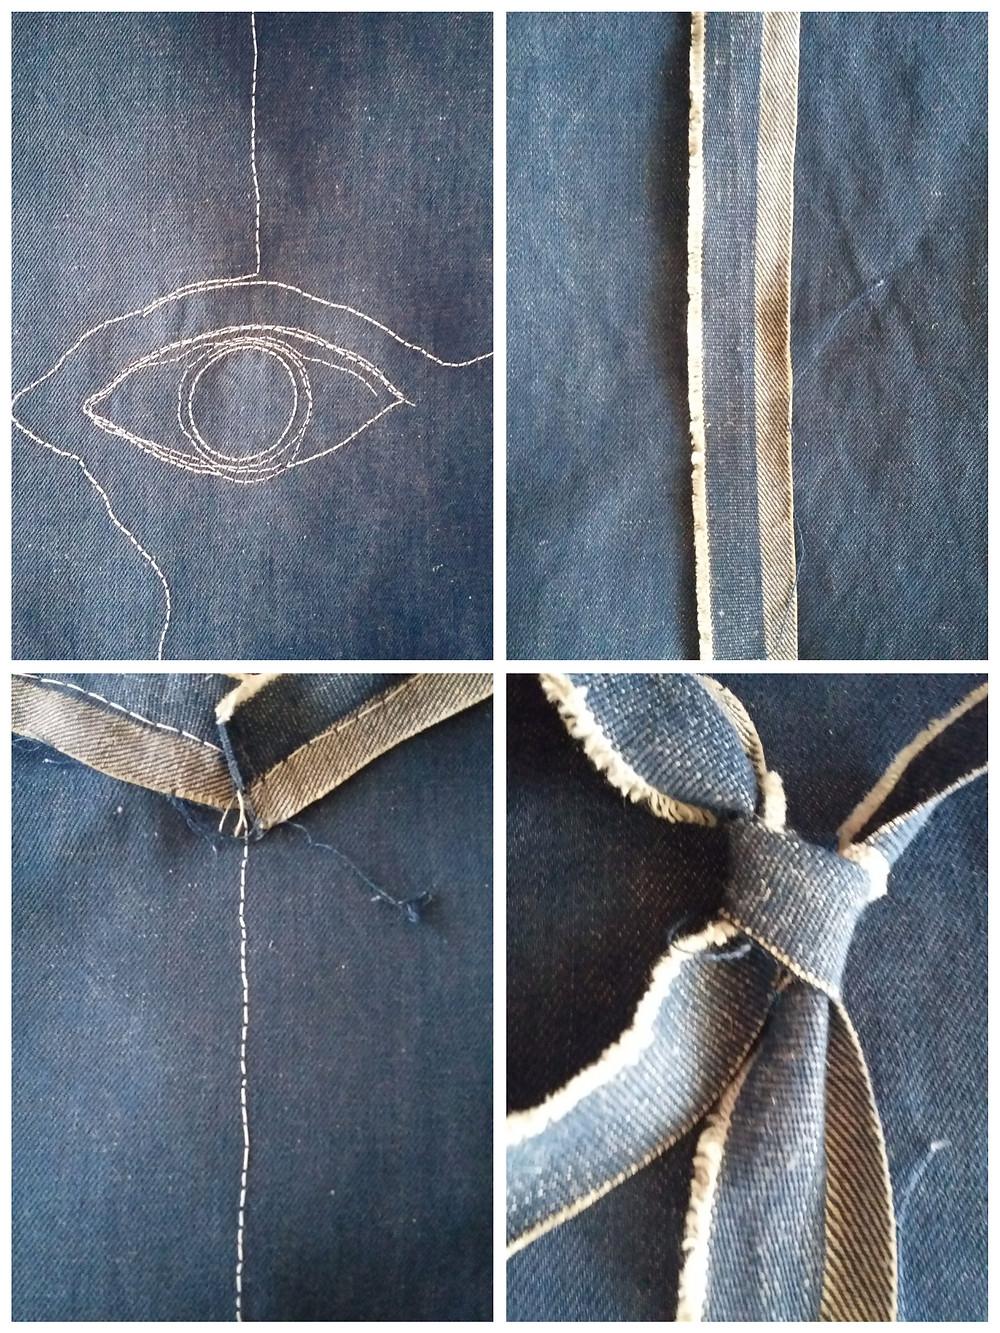 'Osservare', 2019 textile artwork by Alessandra Belgrado